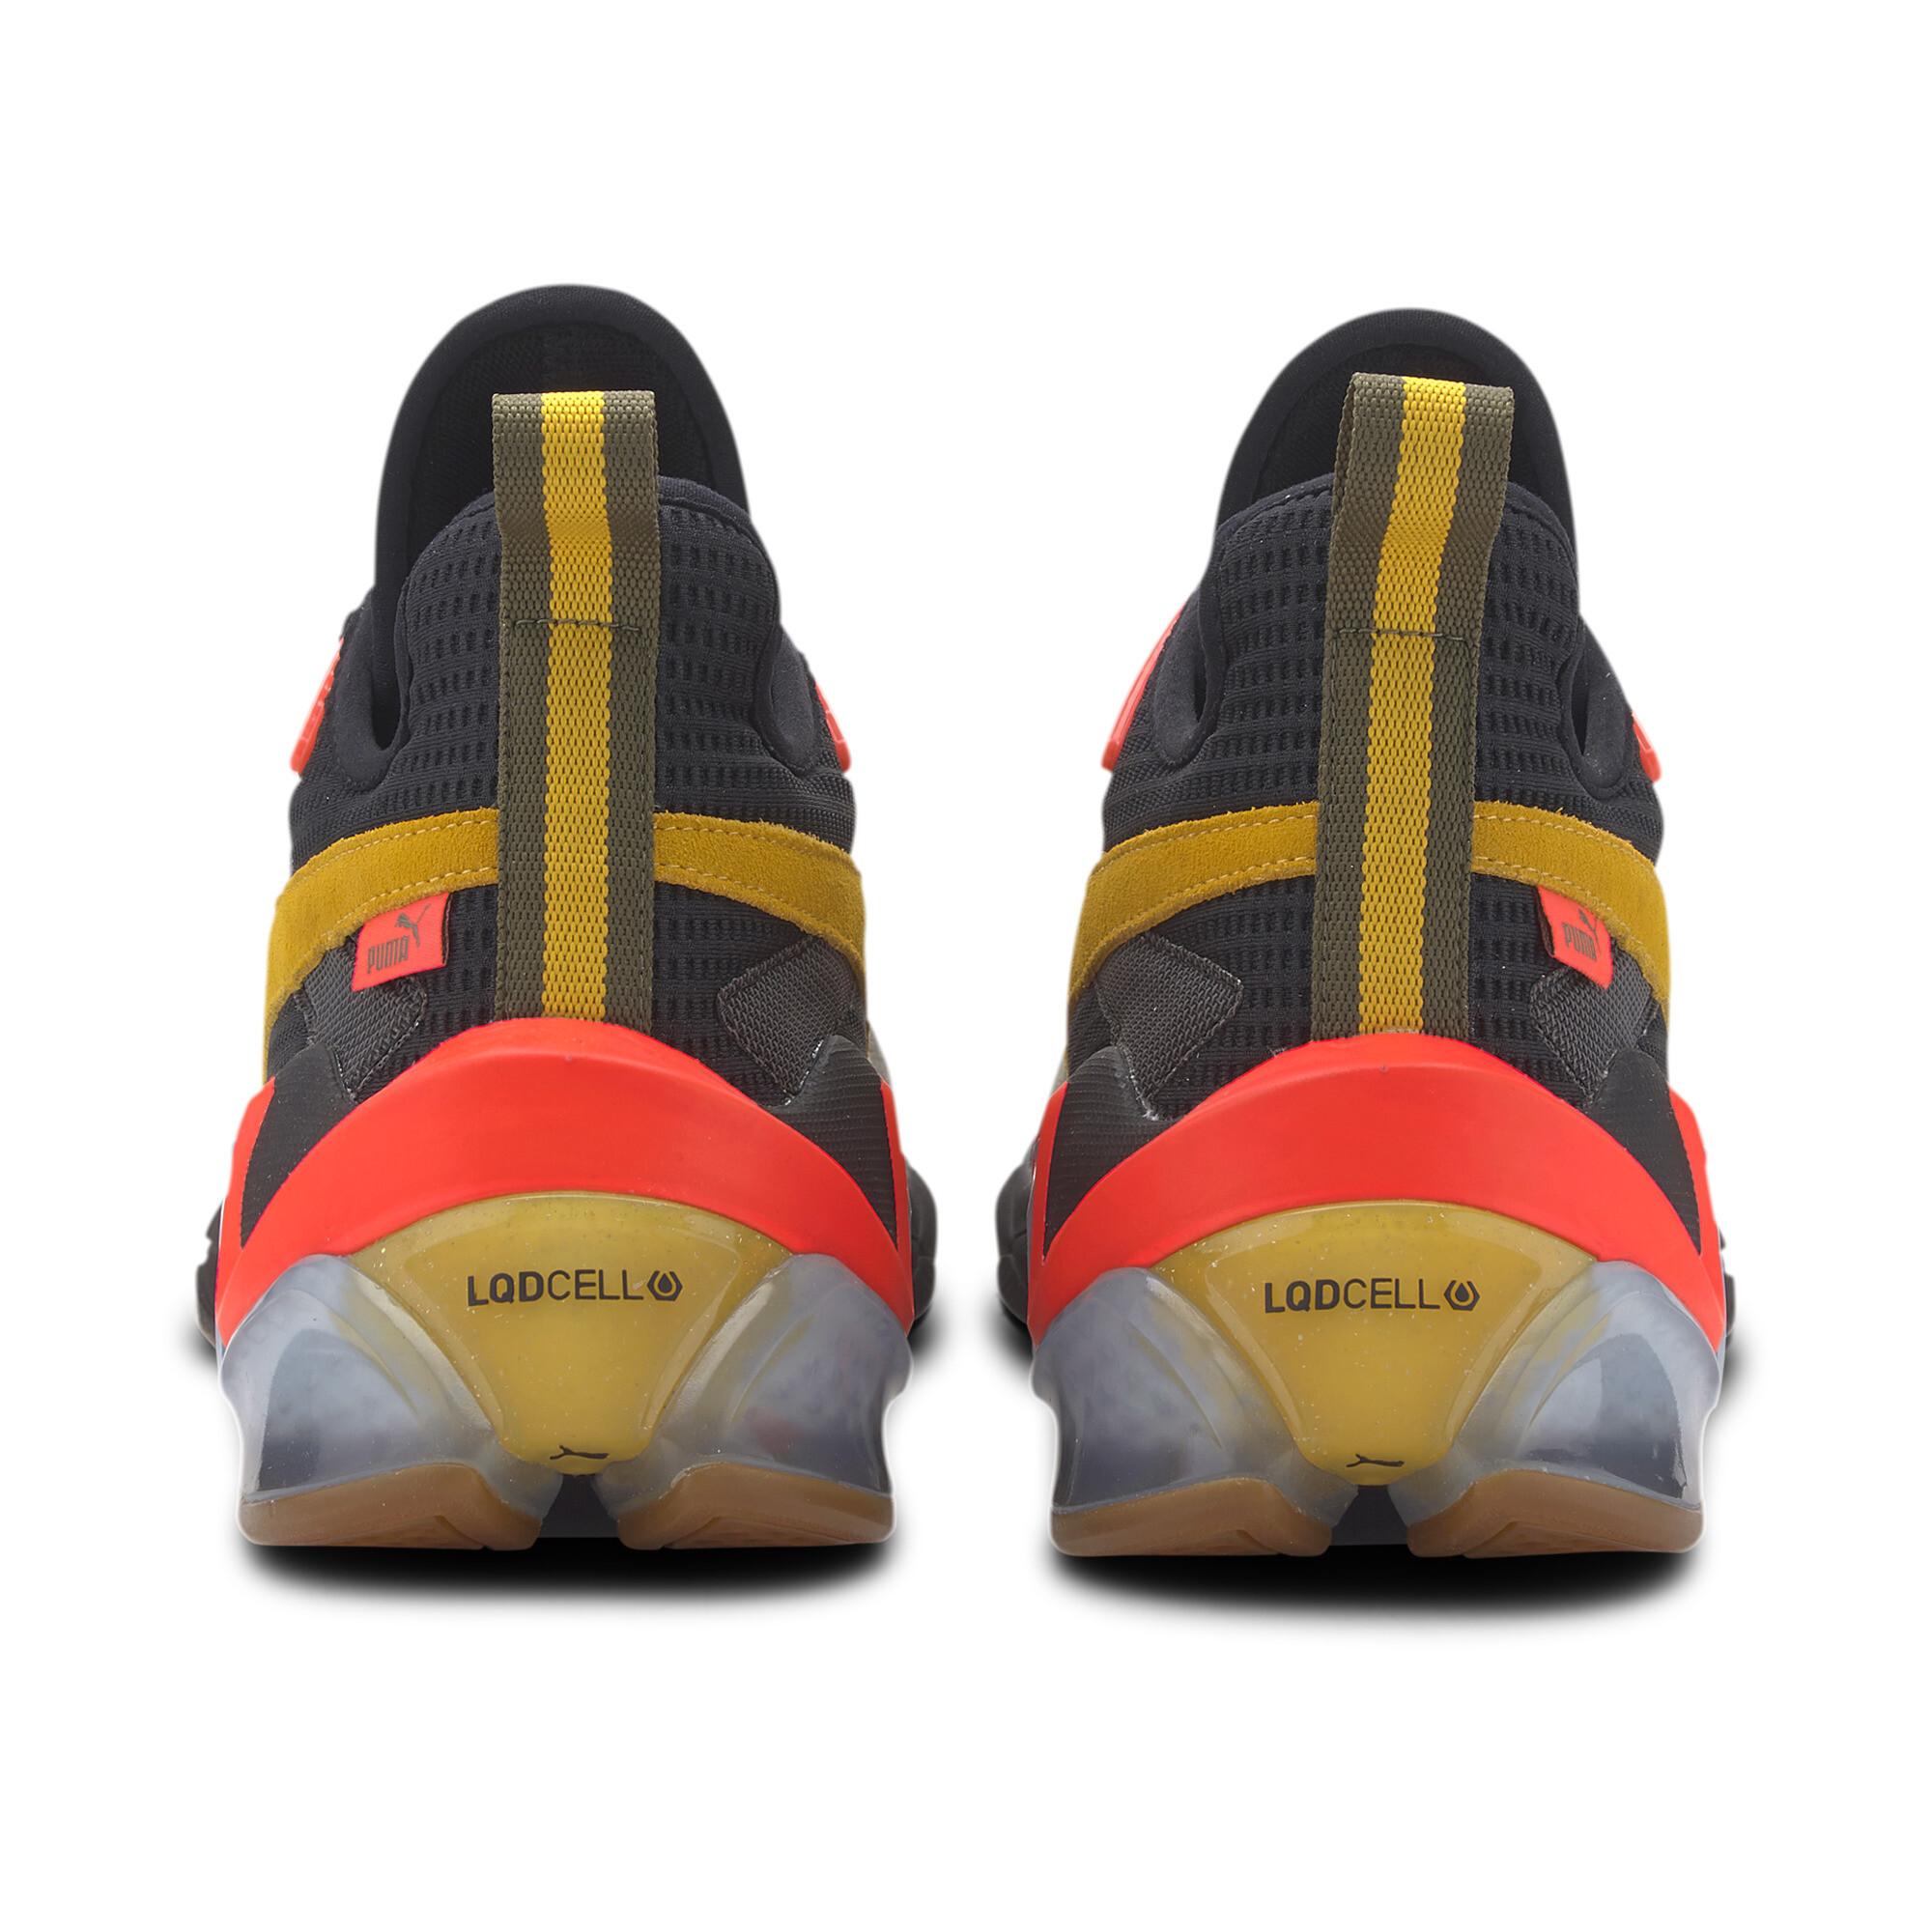 PUMA-Men-039-s-LQDCELL-Origin-Training-Shoes thumbnail 13